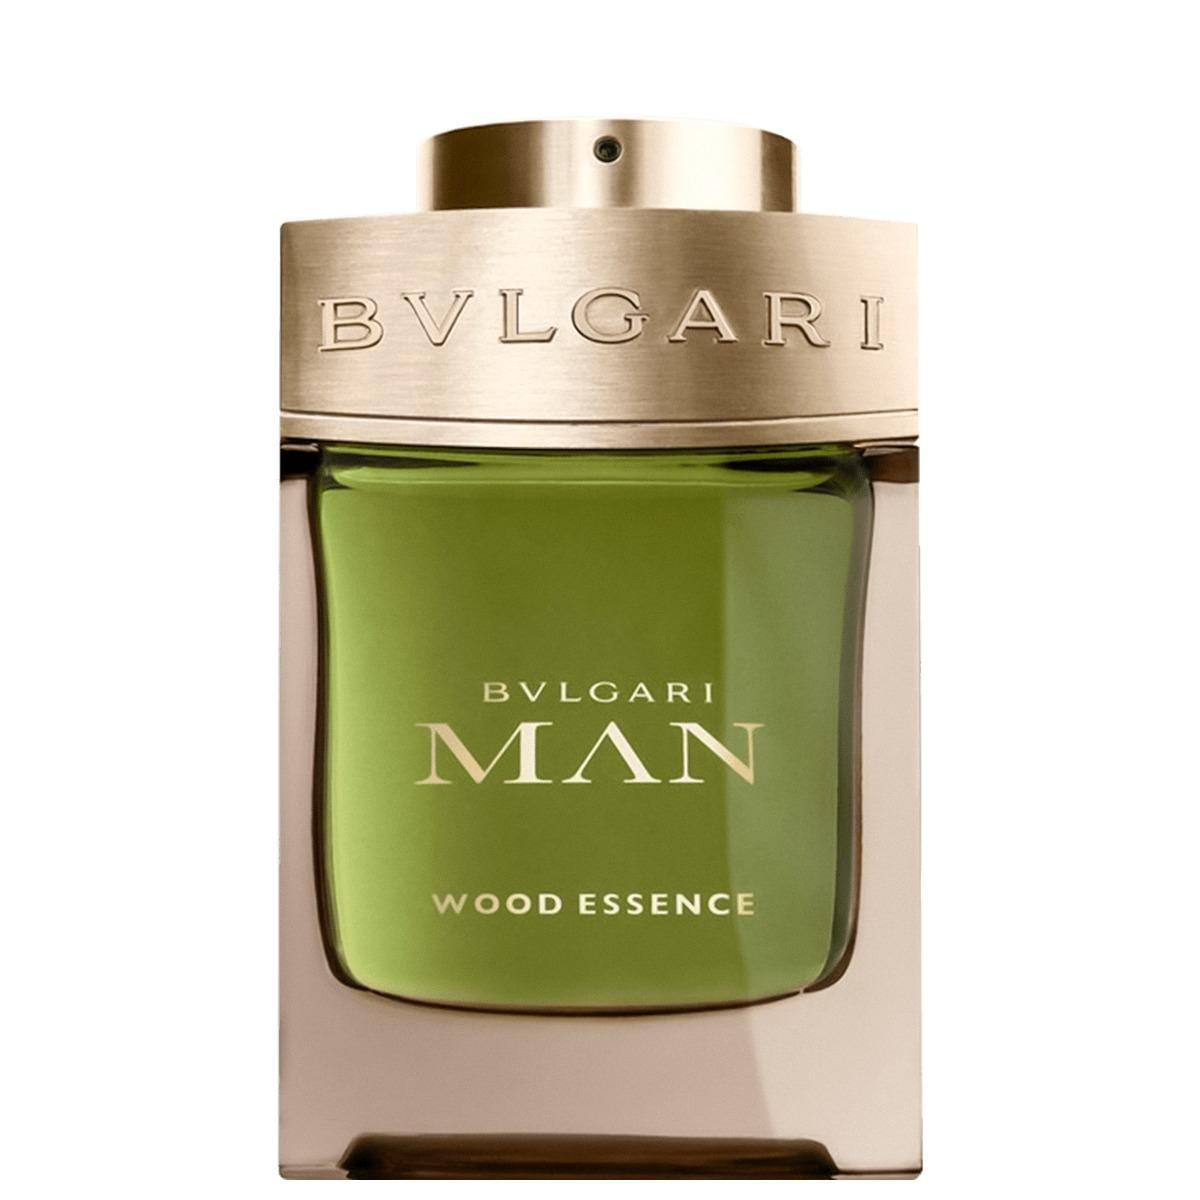 4b3d00e8a61 Wood Essence Man Bvlgari Edp Perfume Masculino 60ml - R  468